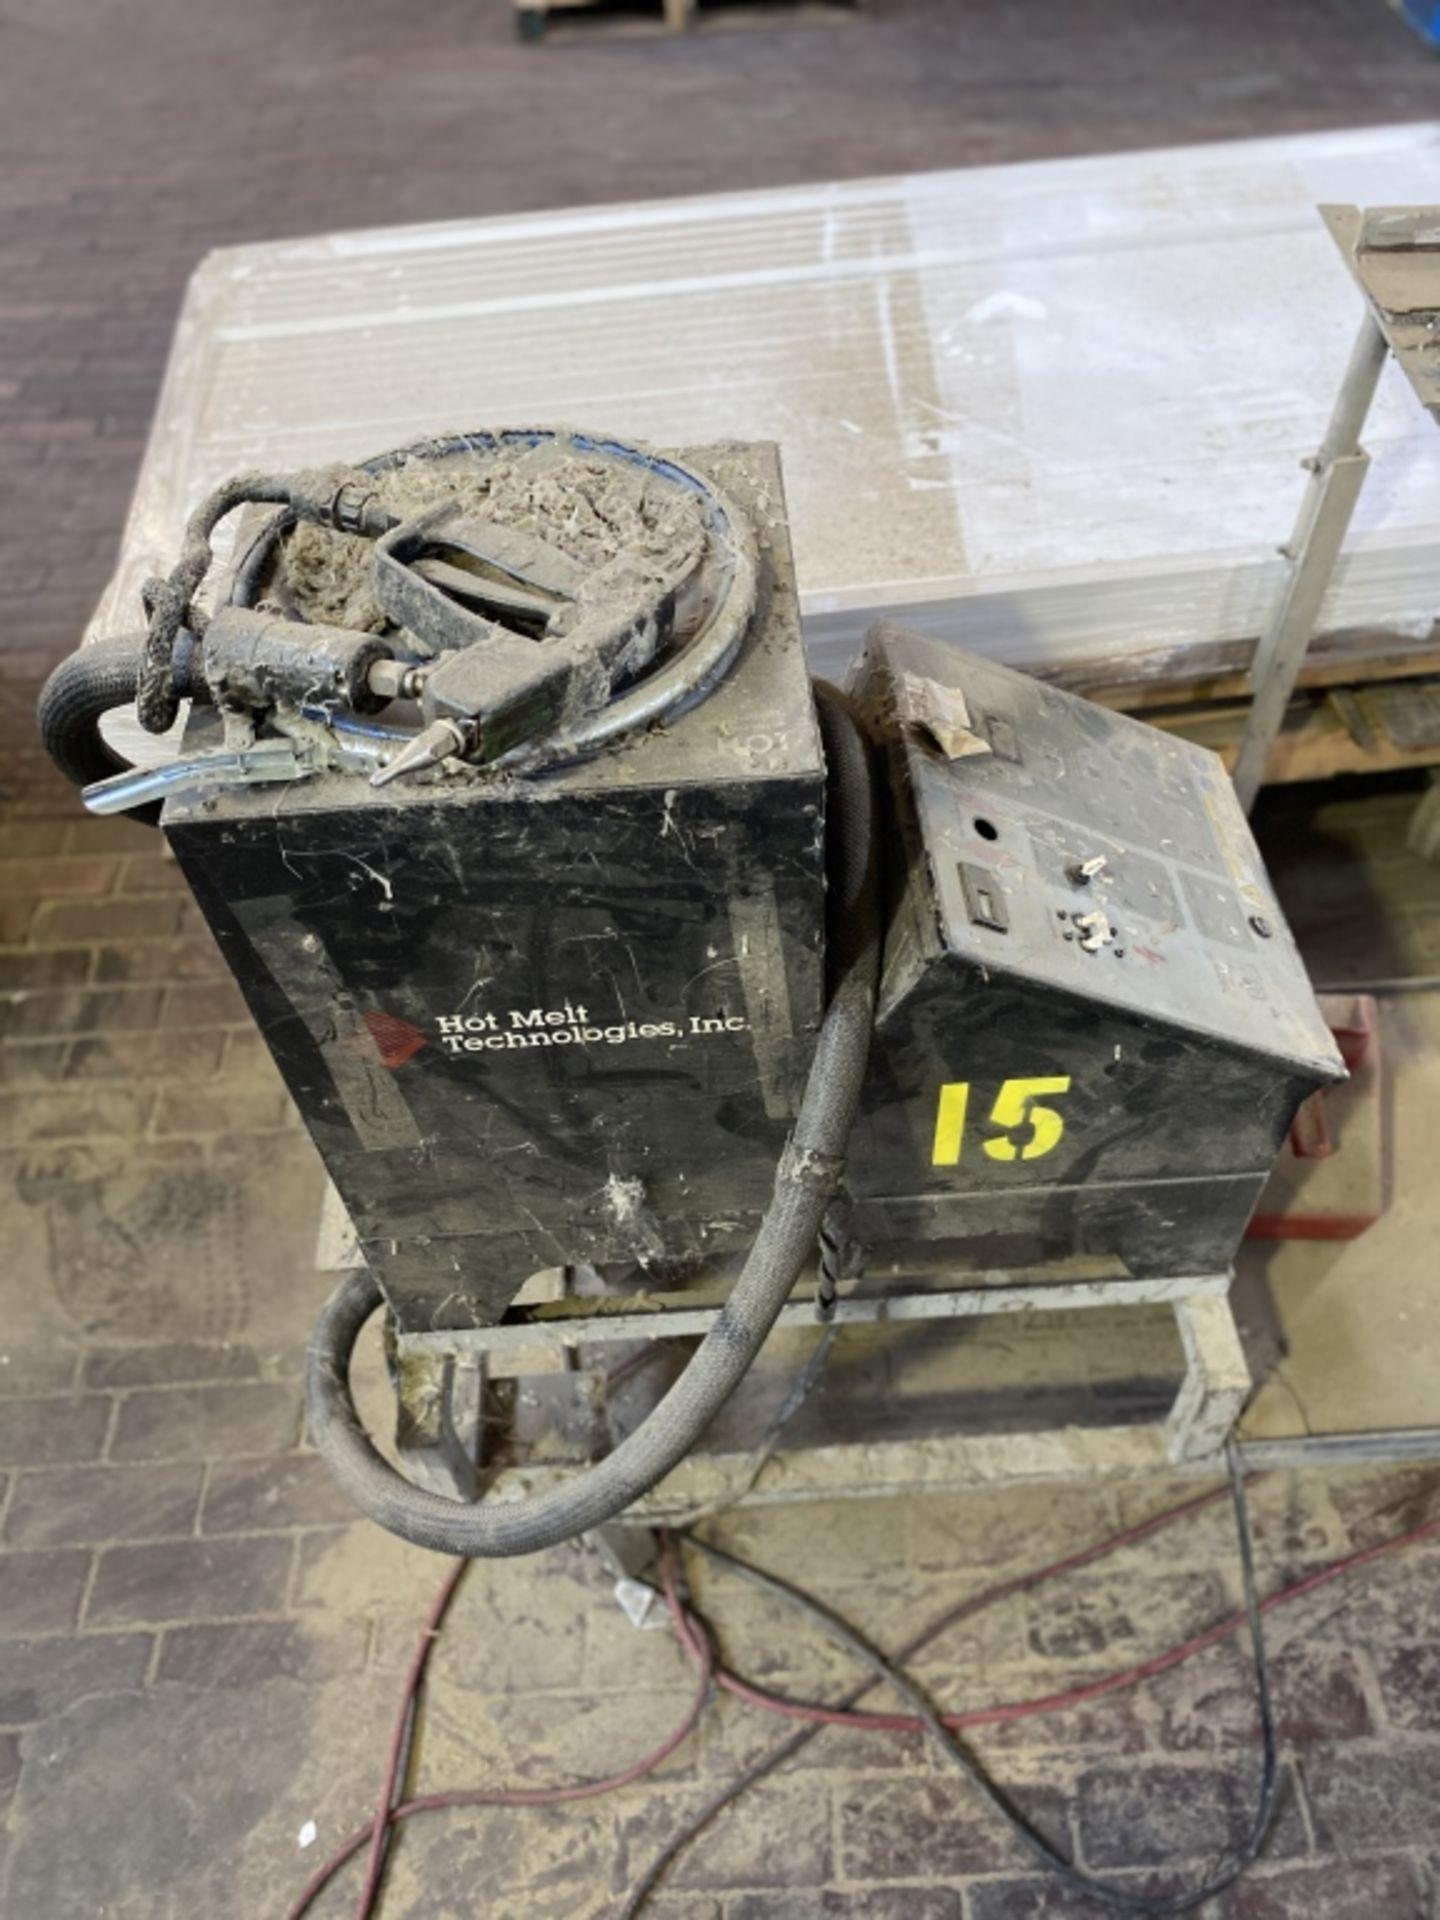 Lot 1006a - Hotmelt Technologies G4